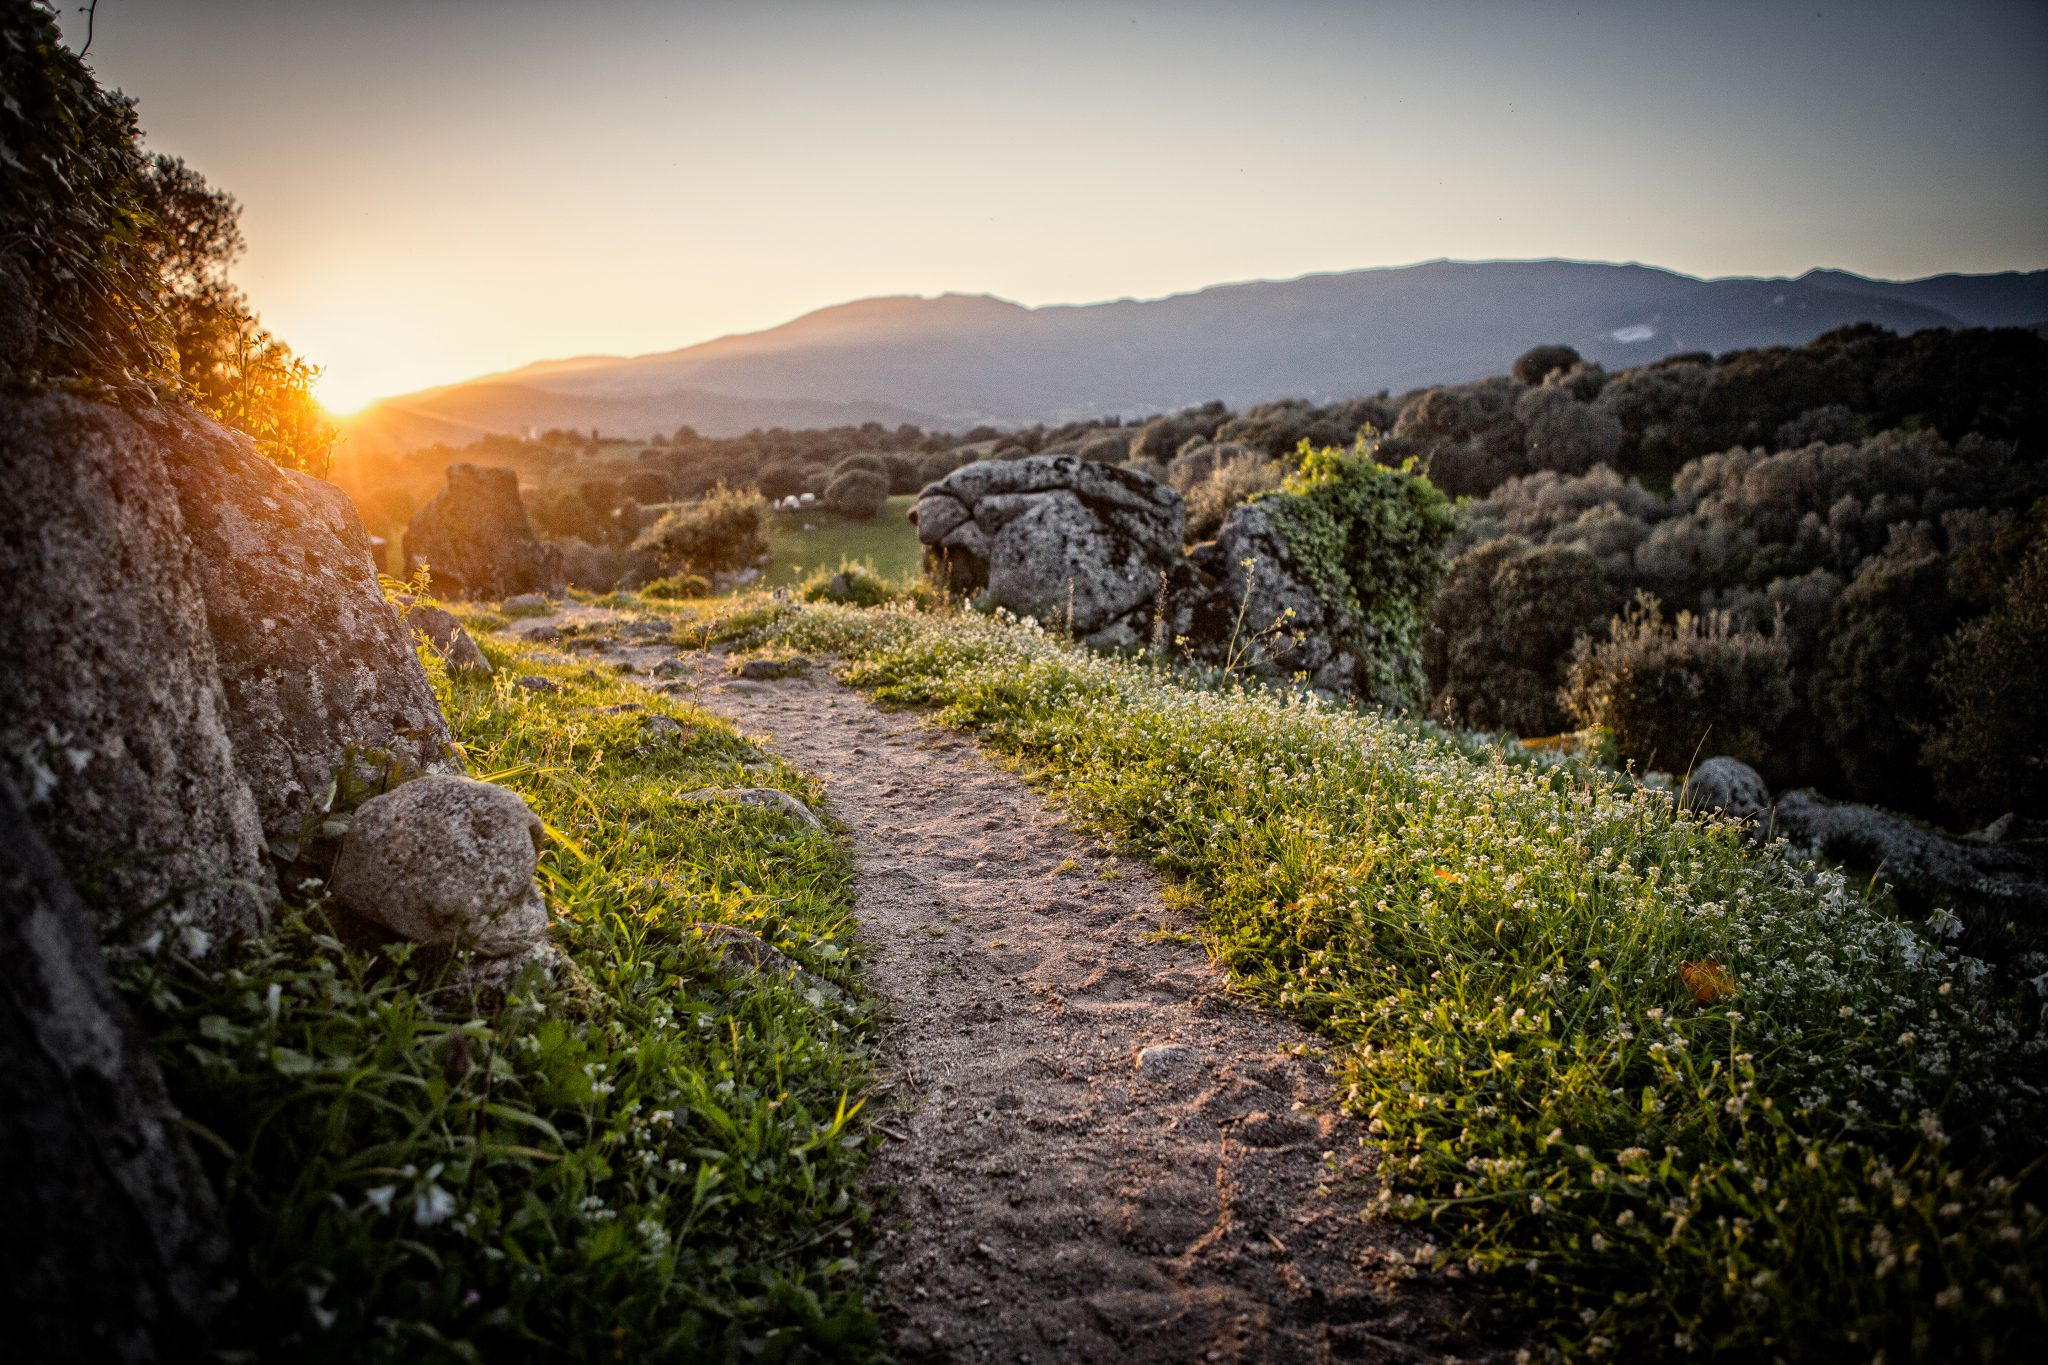 chemin de randonnée dans le Sartenais Valinco Taravo